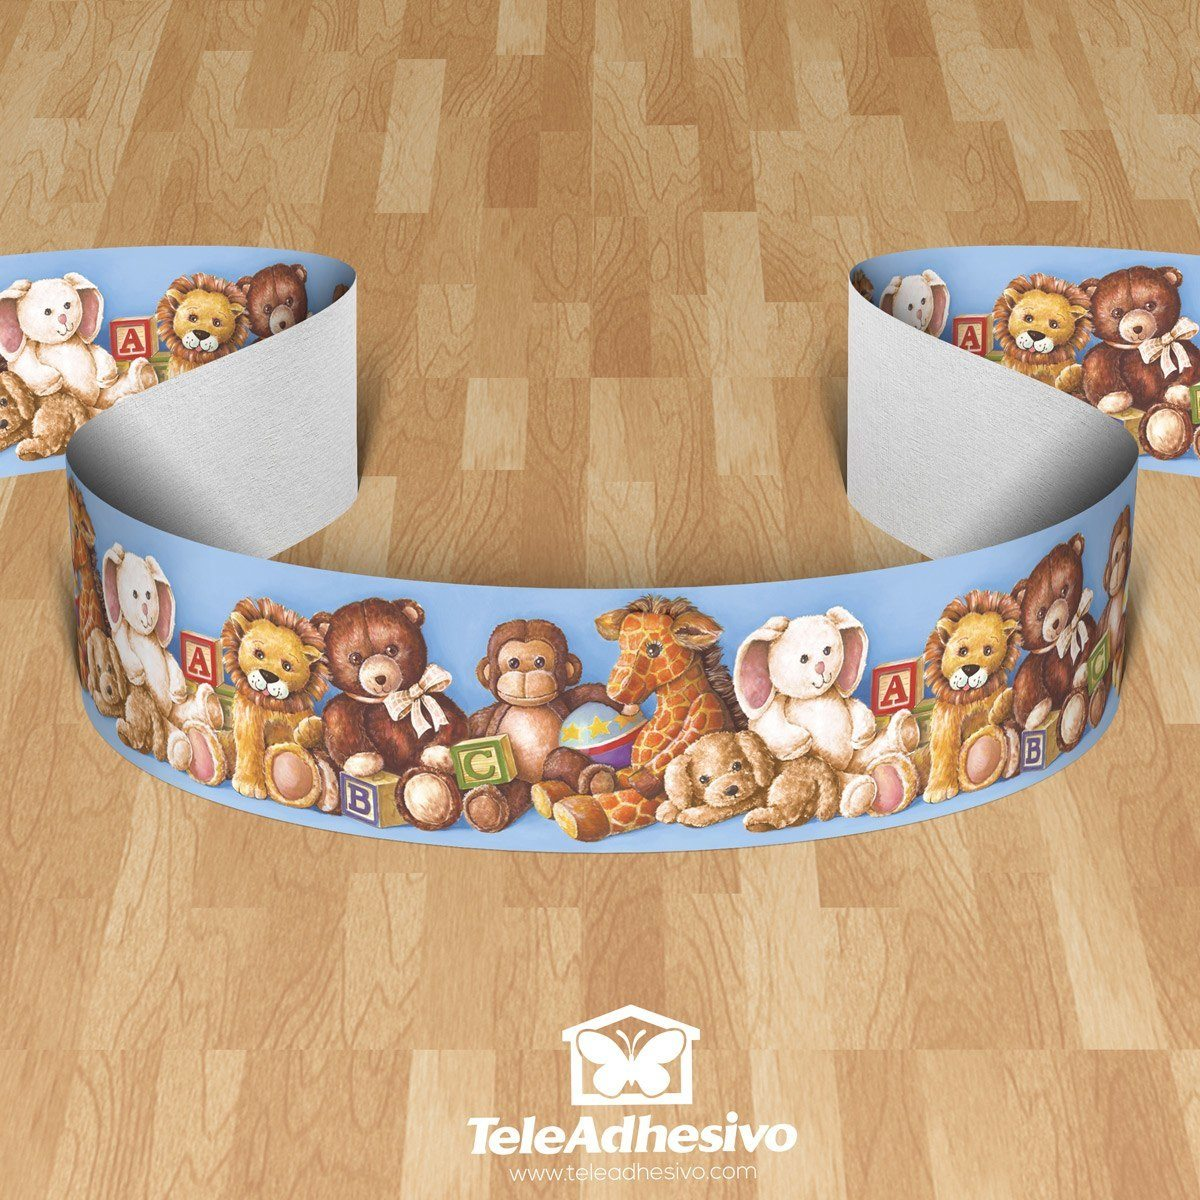 Kinderzimmer Wandtattoo: Bordüre Bären